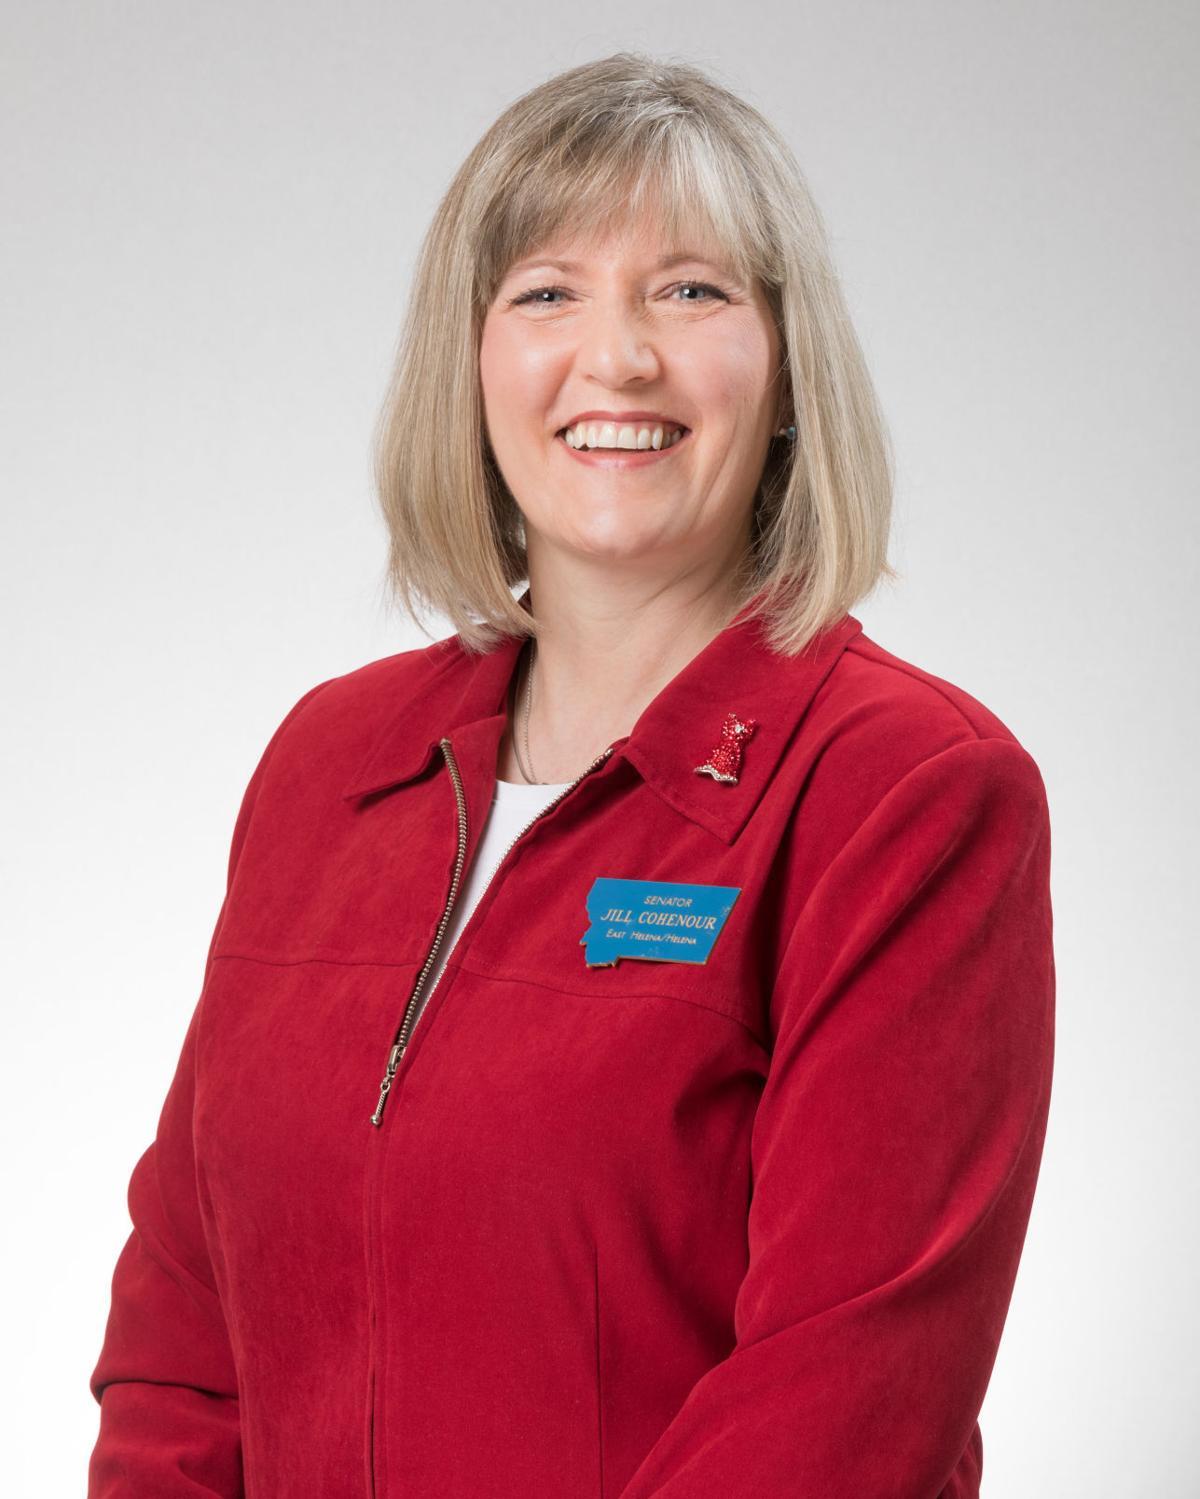 Sen. Jill Cohenour (D-East Helena)